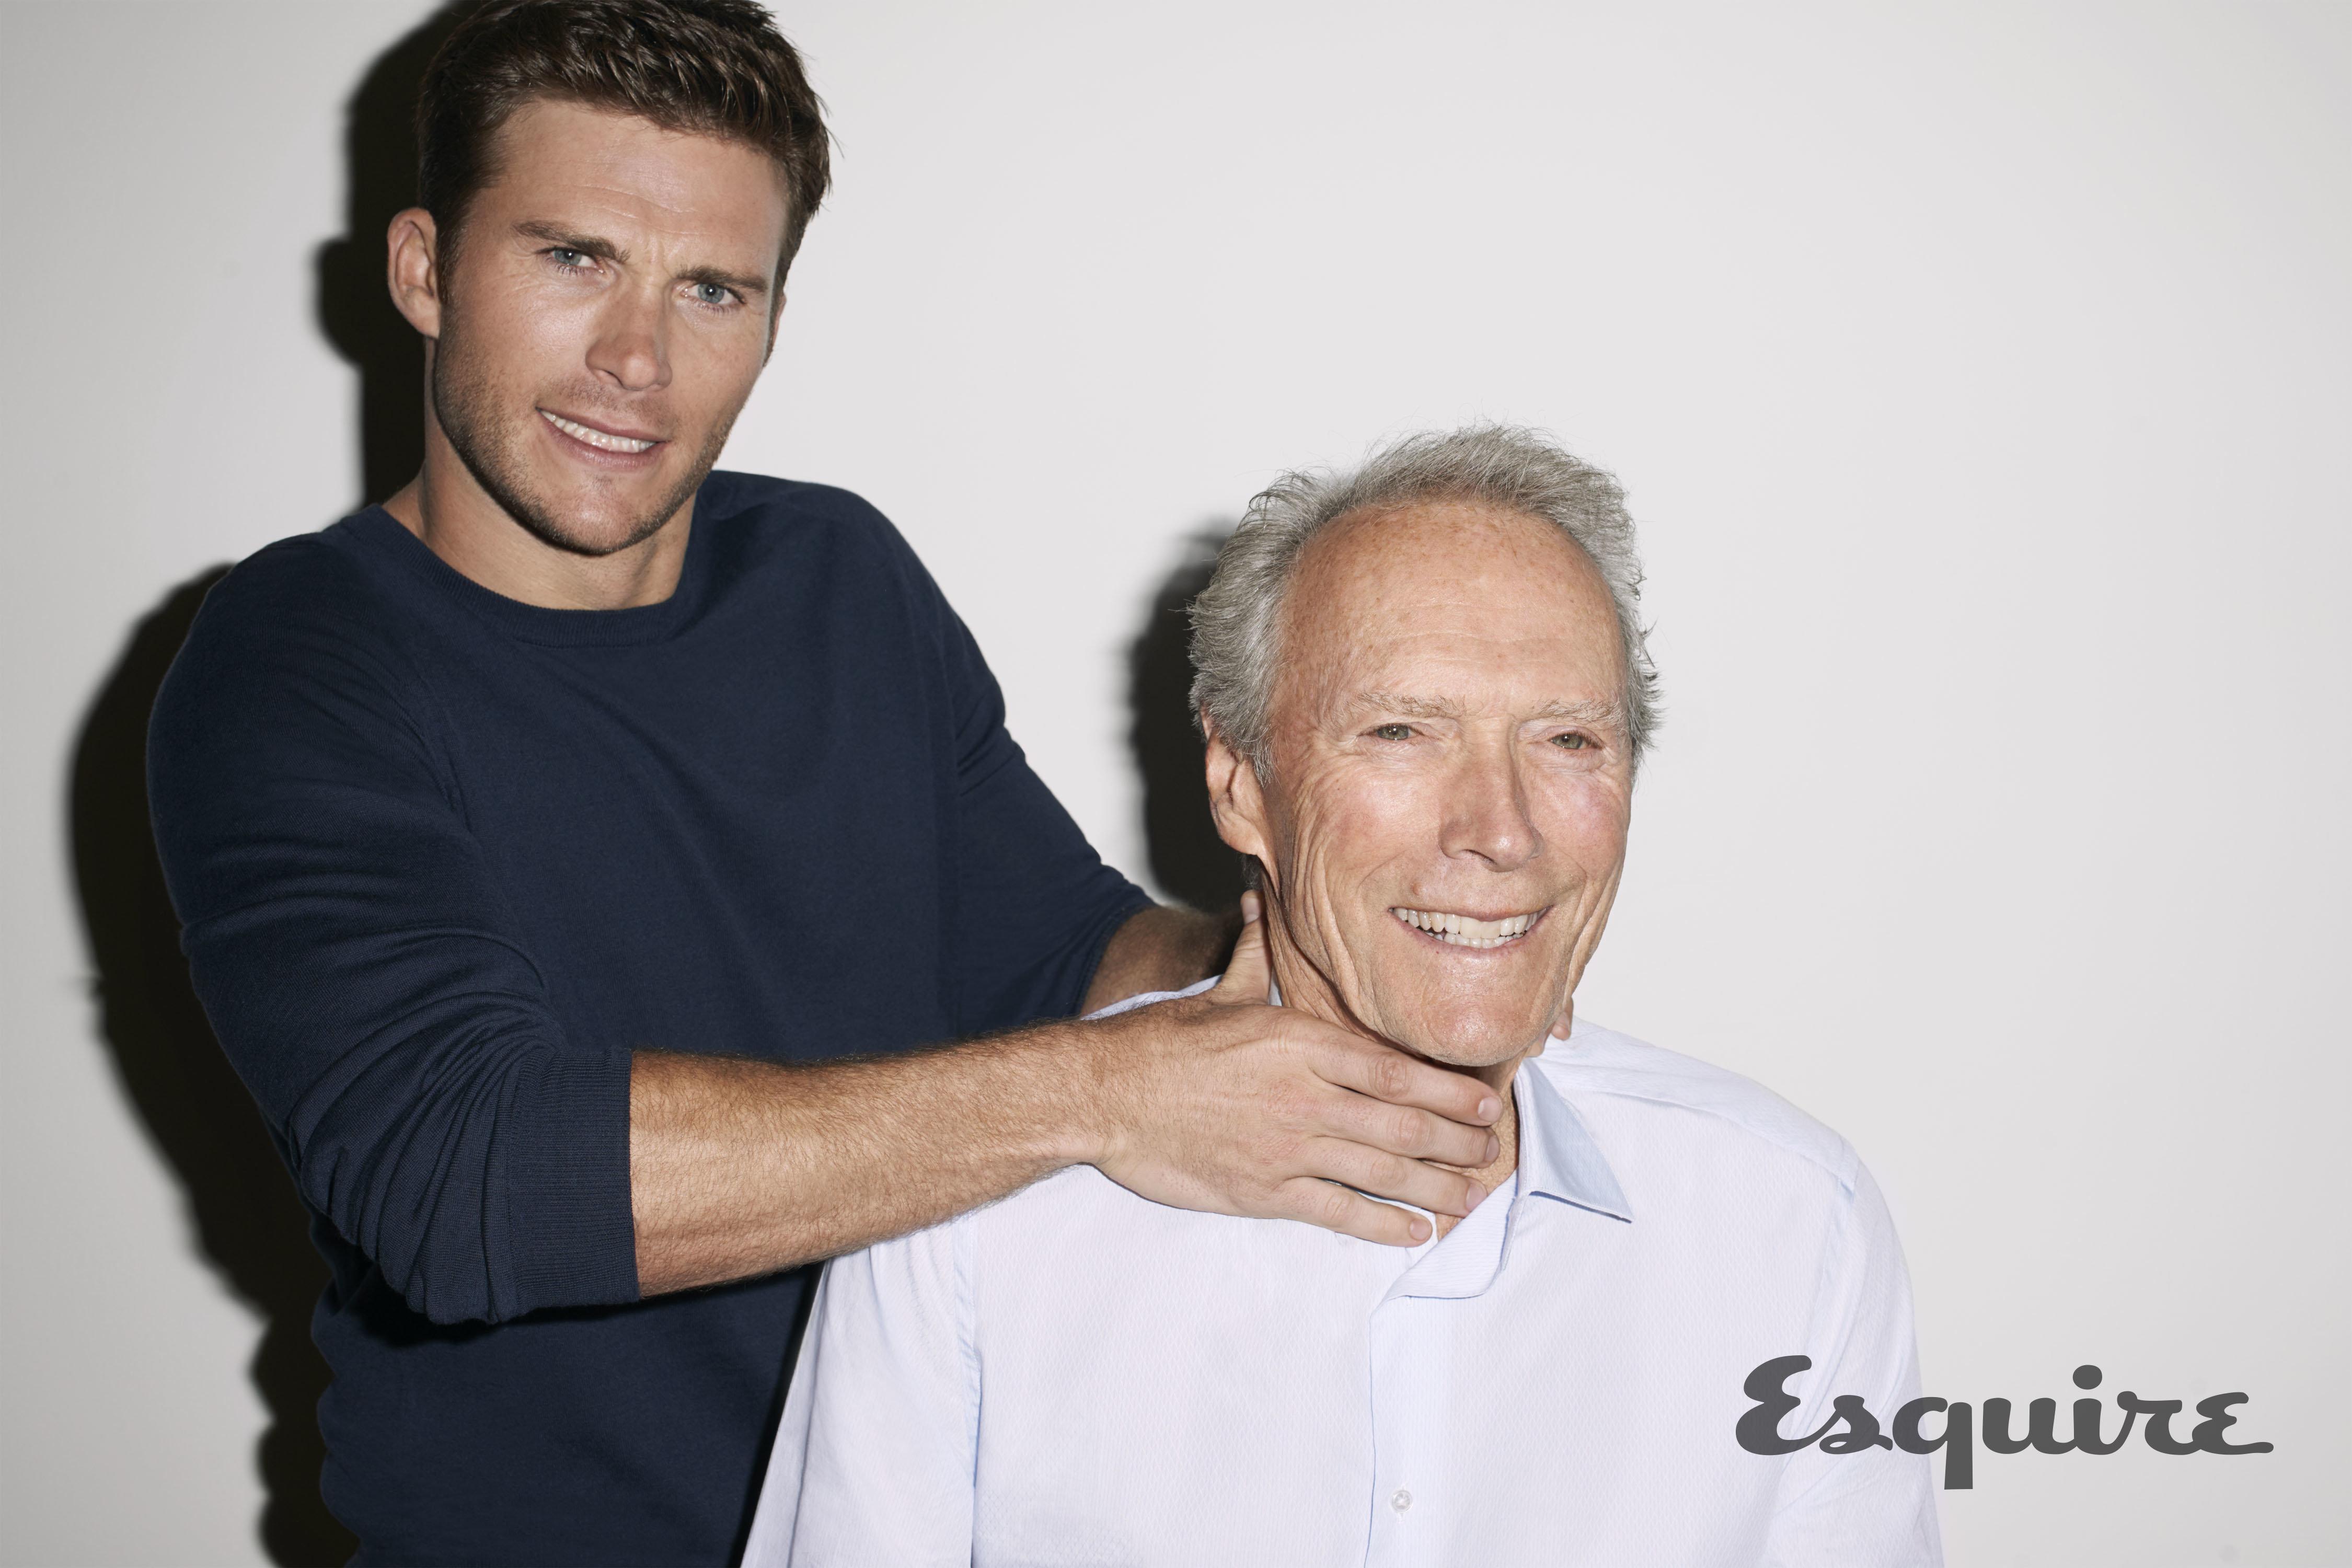 Clint was interviewed alongside son Scott by Esquire